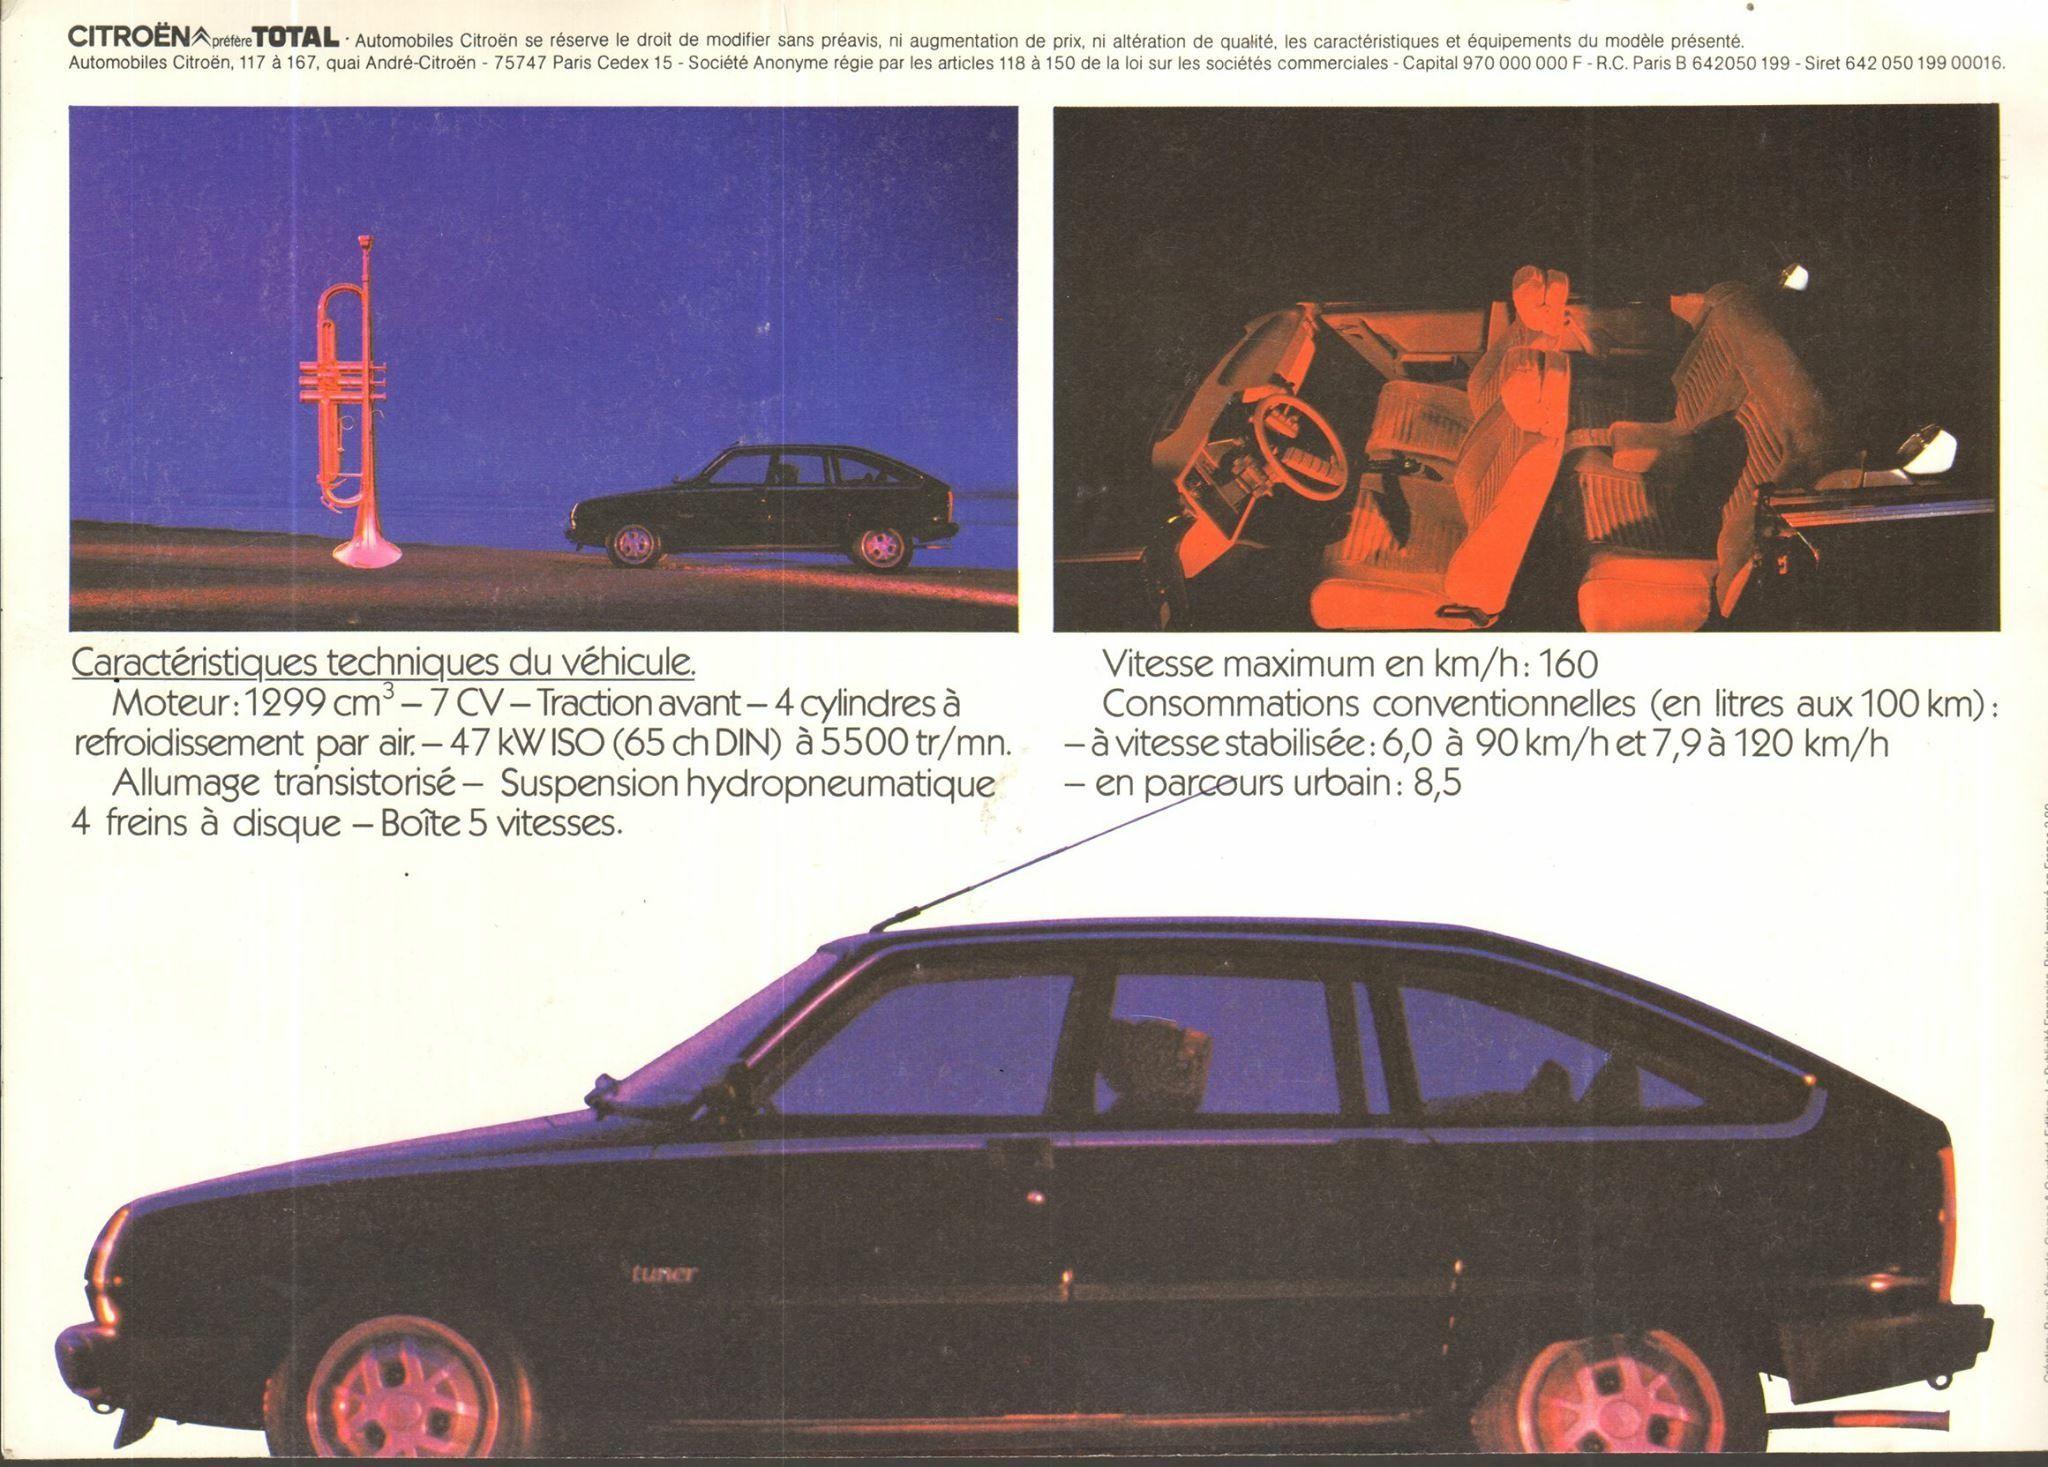 Citroen Gsa Tuner Brochure